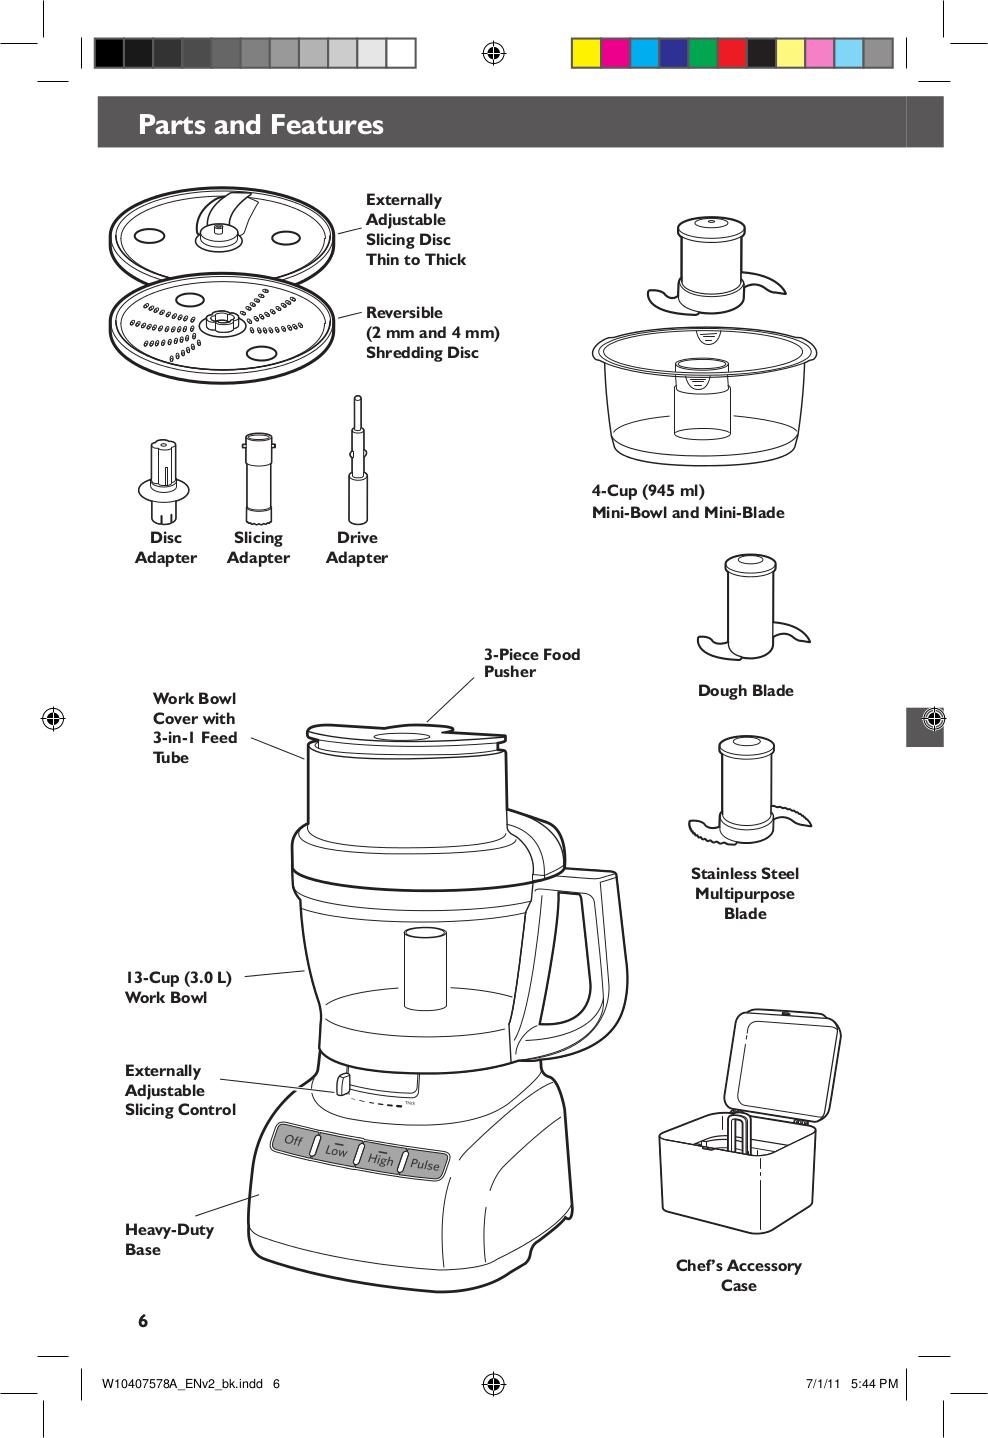 Kitchenaid Food Processor Kfp1333 Pdf Page Preview